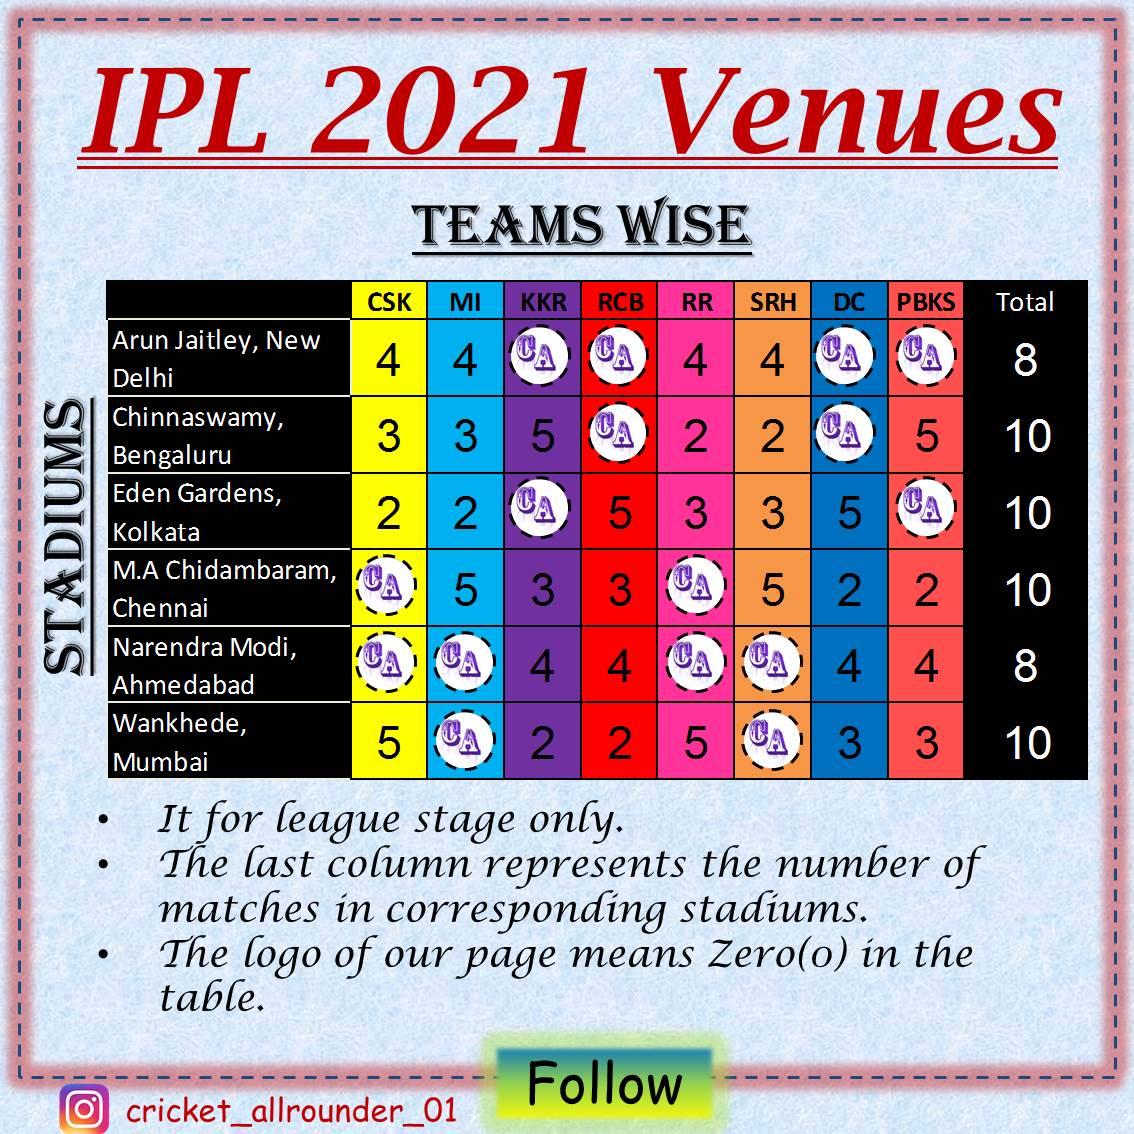 Share it.  Follow @01_allrounder  for IPL 2021 updates.  #ipl #ipl2020 #ipl2021 #vivoipl #indianpremeirleague #royalchallengersbangalore #mumbaiindians #chennaisuperkings #punjabkings #delhicapitals #rajasthanroyals #sunrisershyderabad #kolkataknightriders #ipl2021schedule